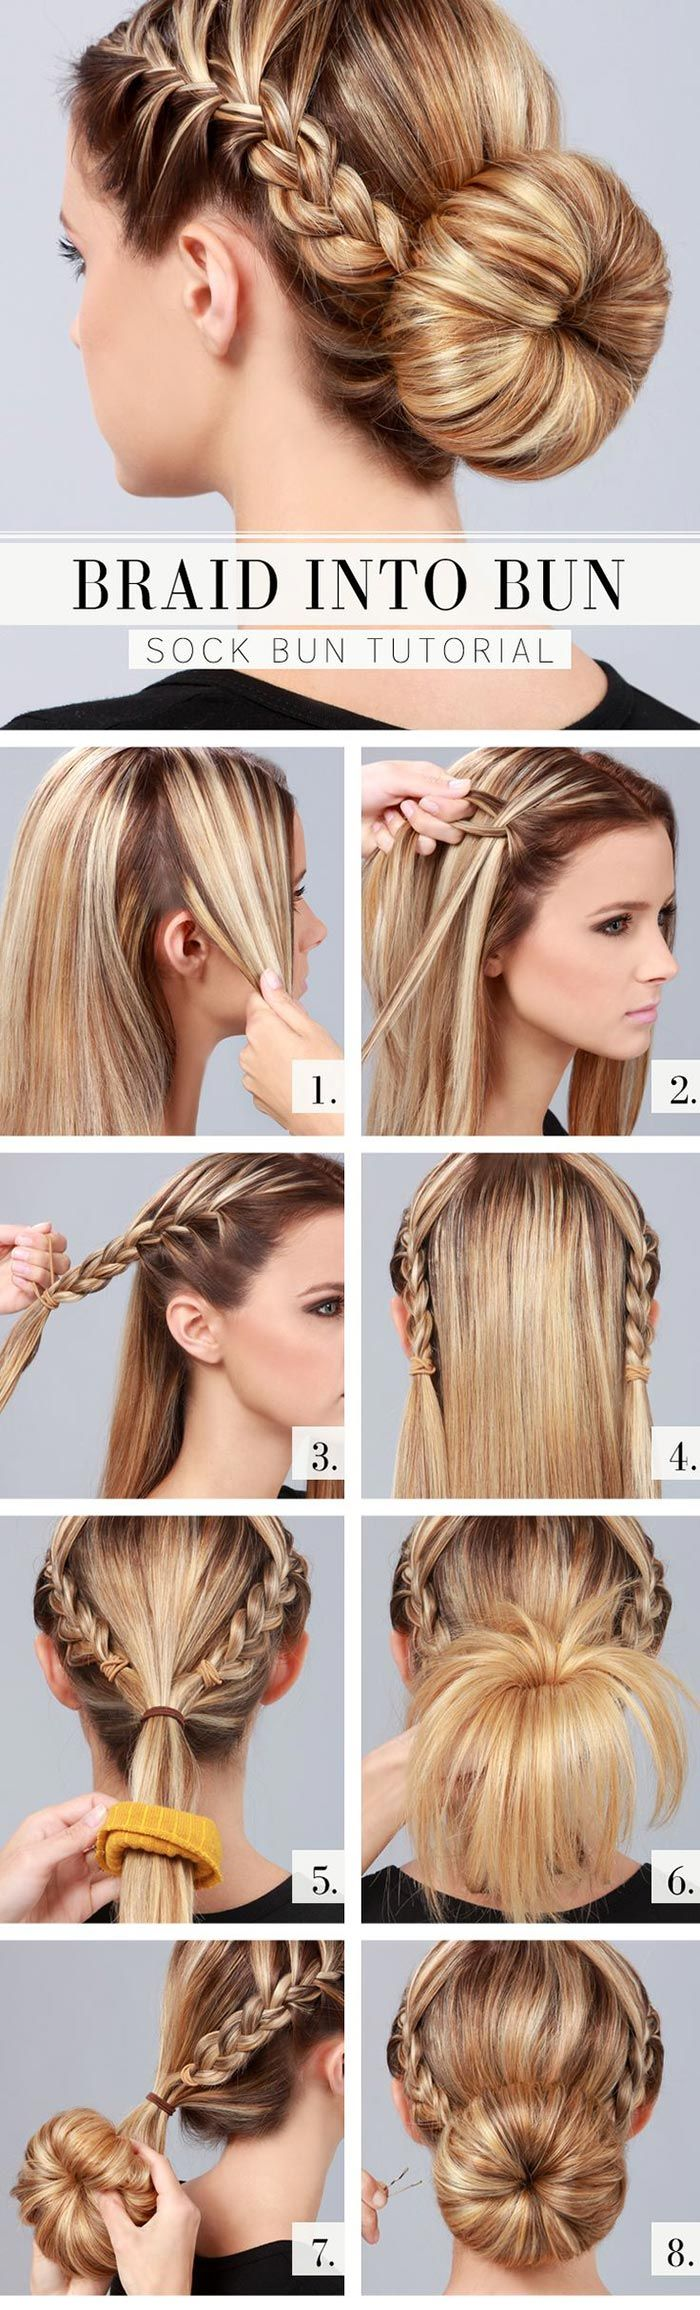 penteados com tranças hair style school hairstyles and easy